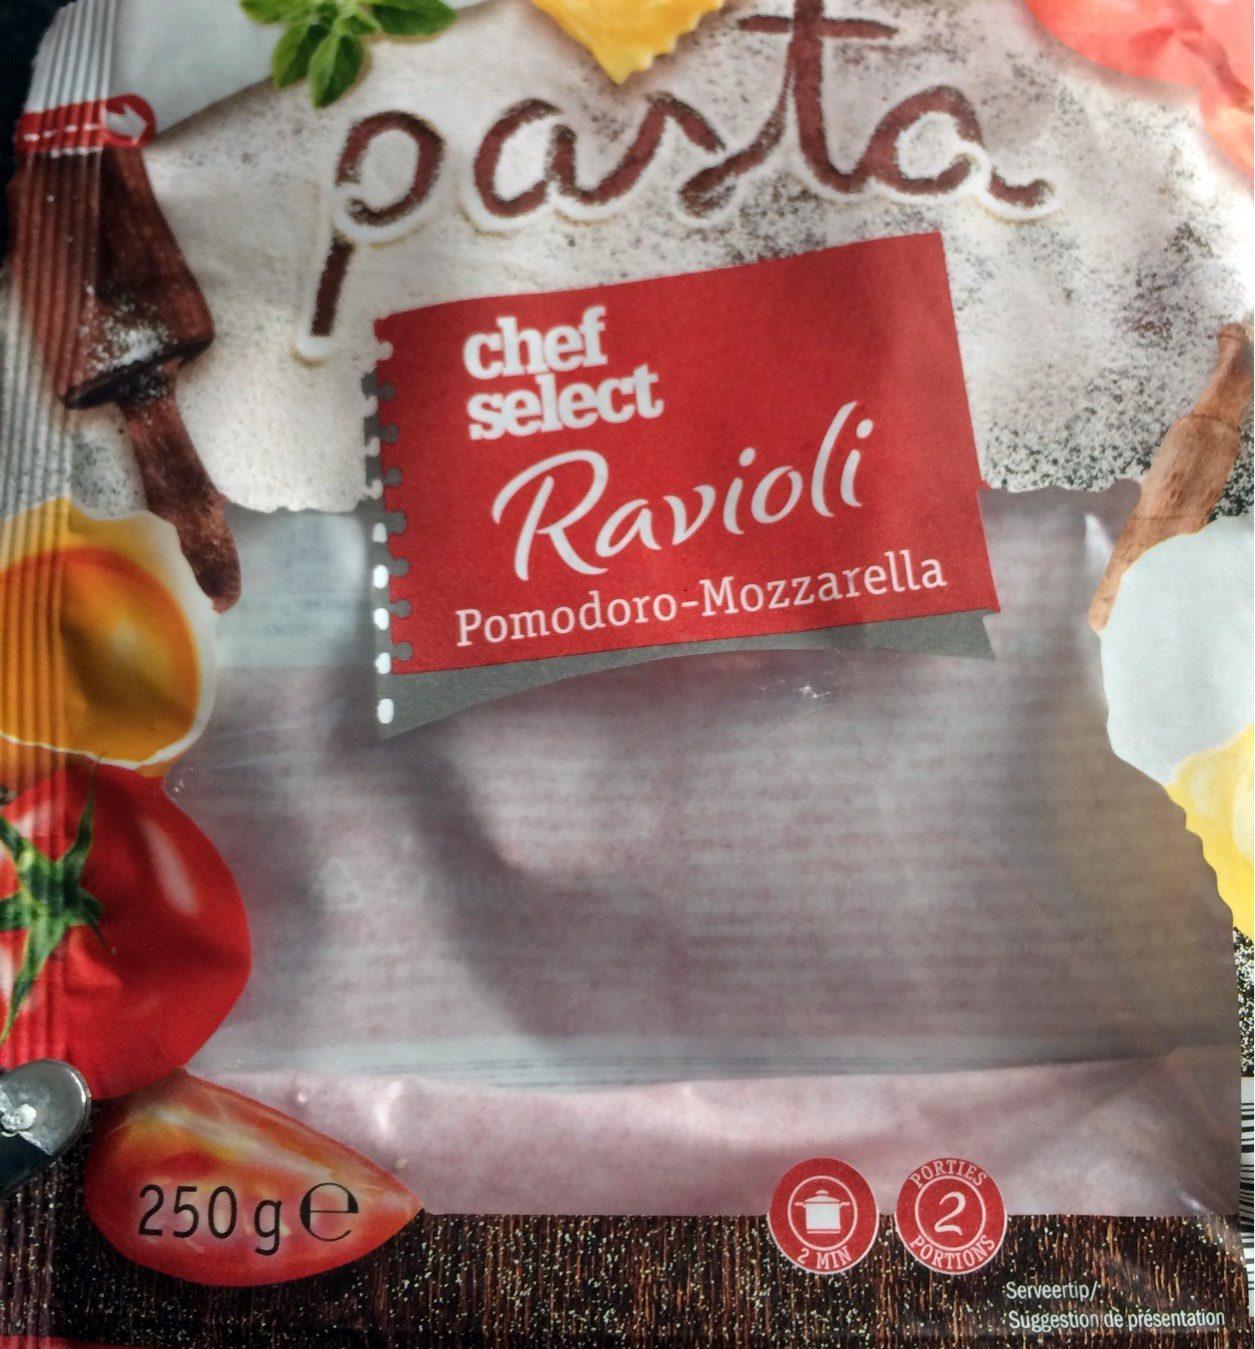 Ravioli Pomodoro-Mozzarella - Producto